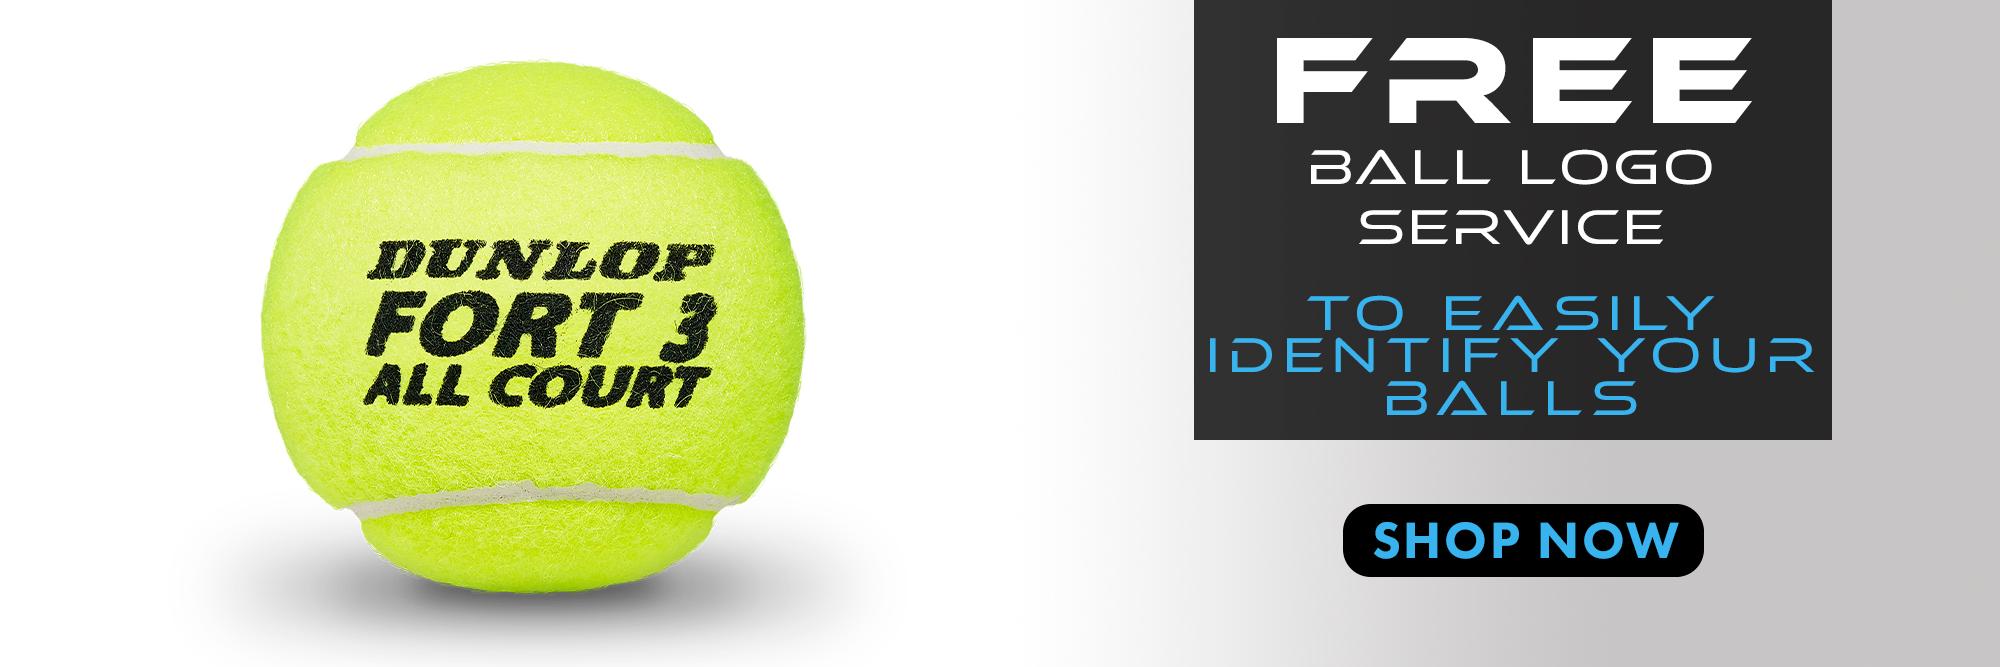 Free Ball Logo Service